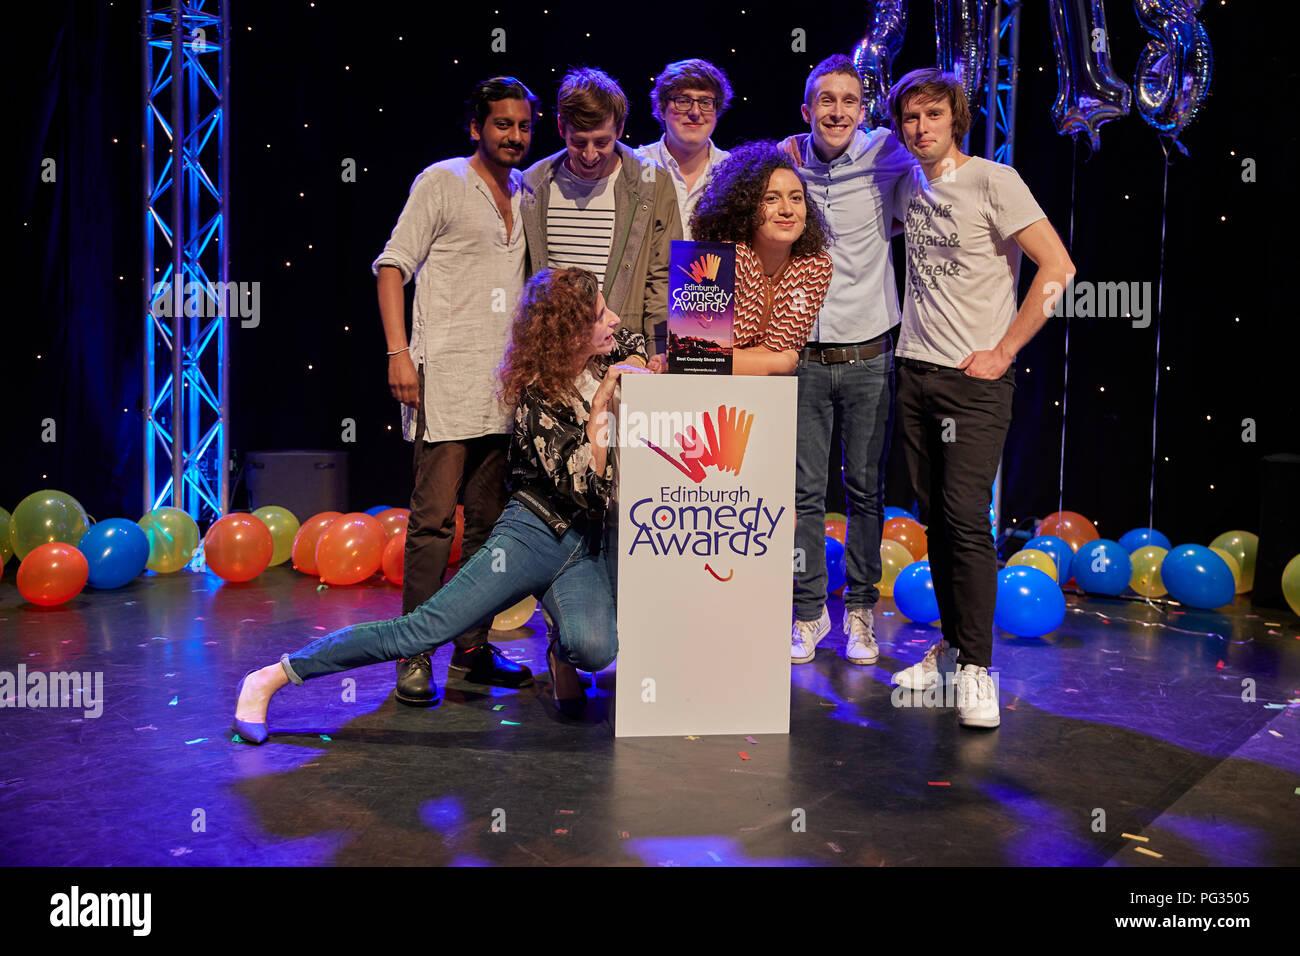 Edinburgh, UK. 23rd August 2018. Edinburgh Comedy Awards 2018. Credit: Andrew Eaton/Alamy Live News. - Stock Image